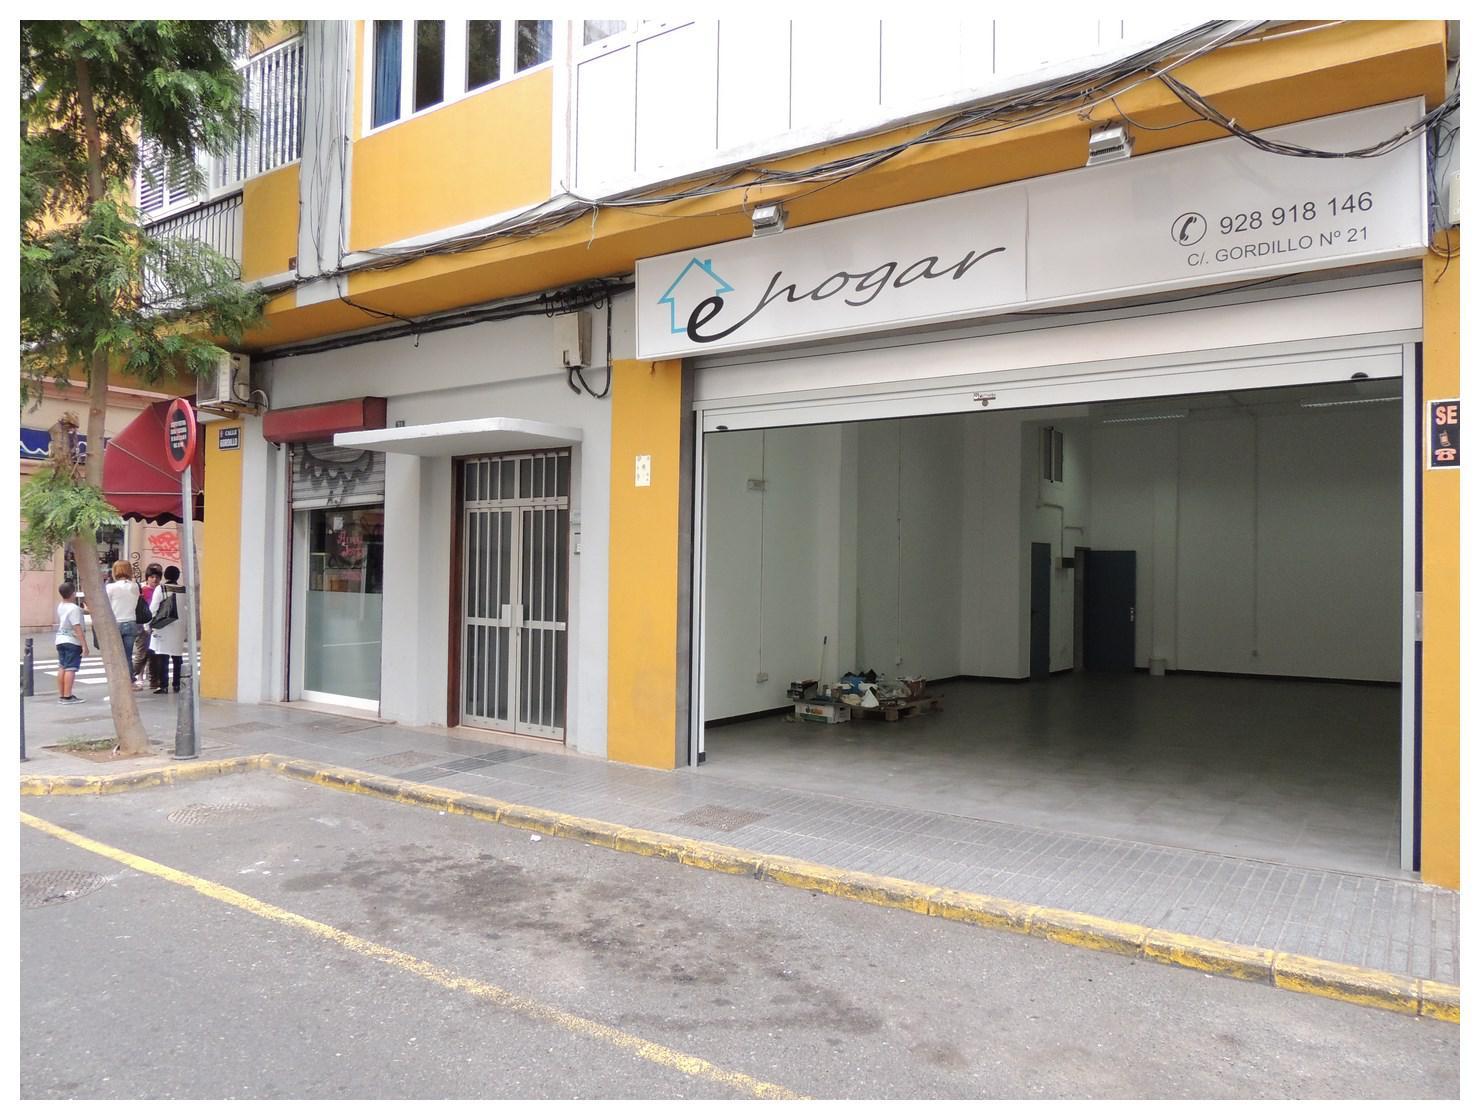 164980 - Estupendo local en la calle Gordillo, (La Naval).